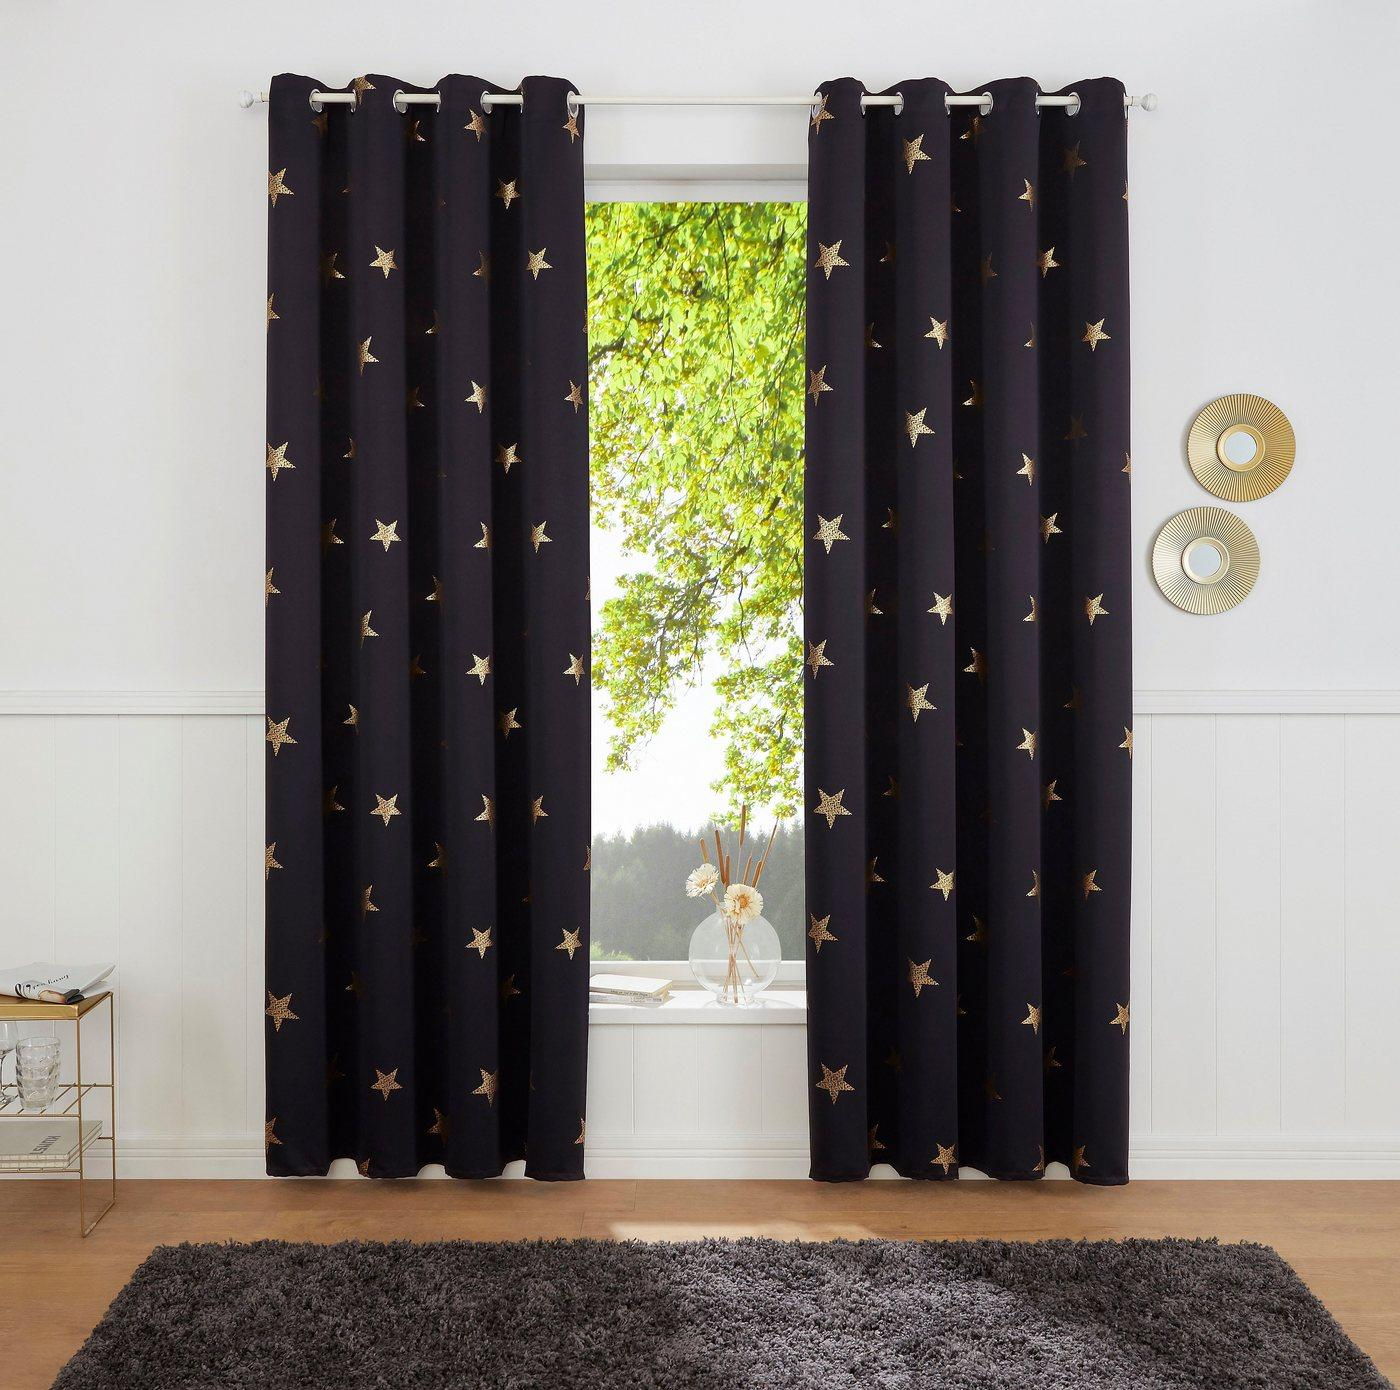 Gardine »Blackout Curtain With Foil Print Star«, my home, Ösen (1 Stück), schwarz